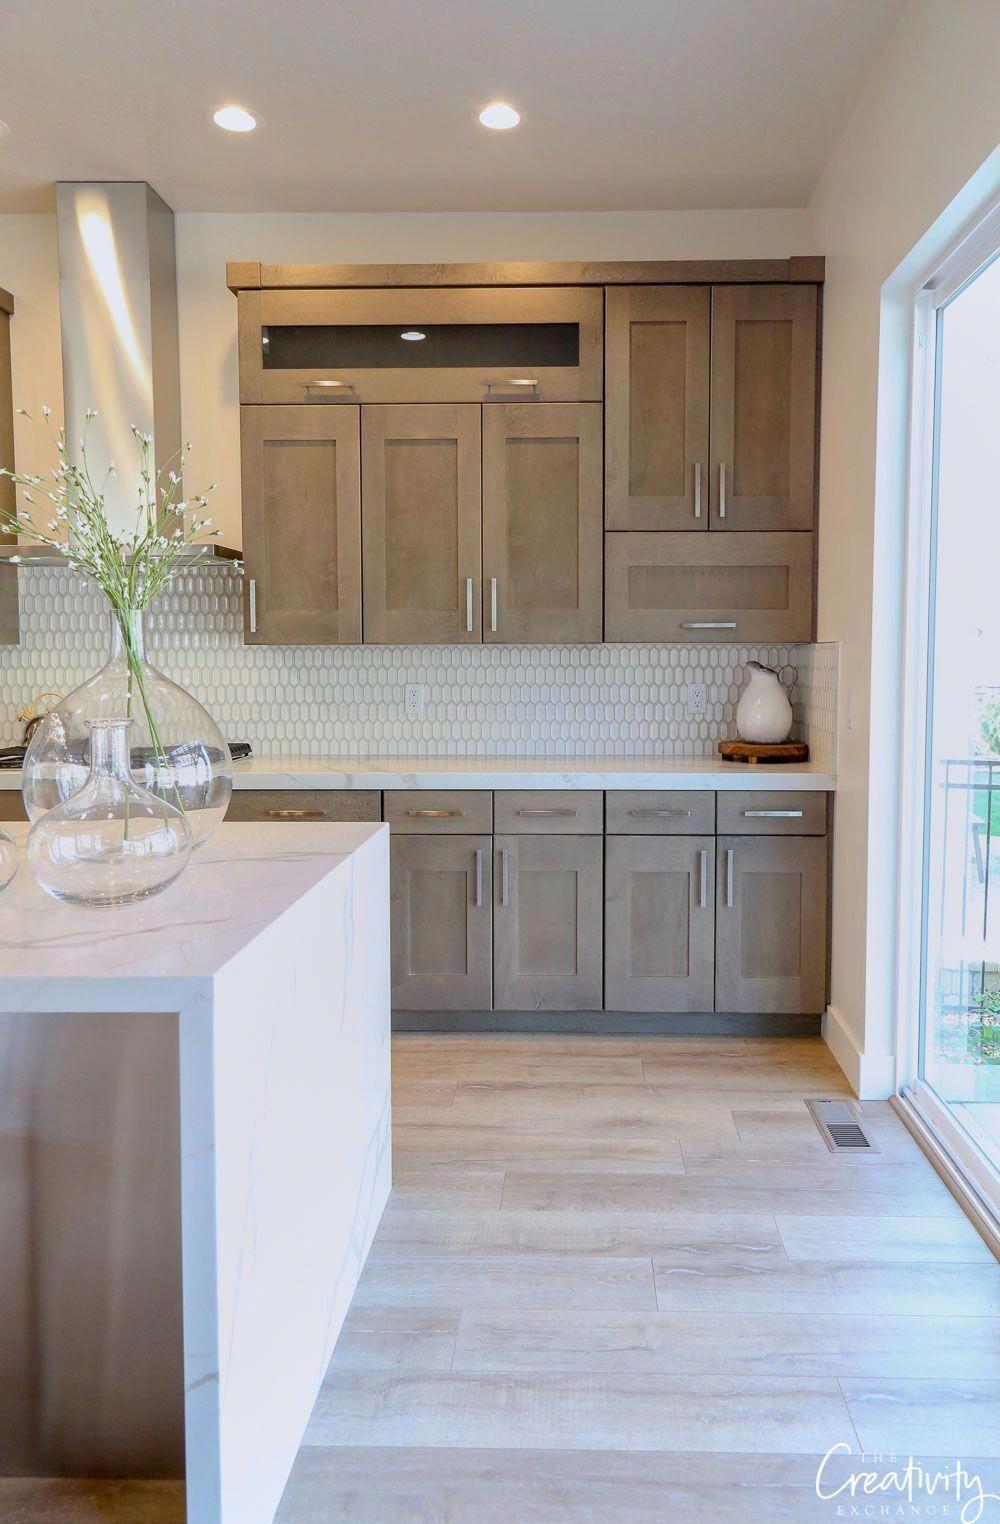 Kitchen Ideas For Small Spaces Kitchen Ideas Remodeling Kitchen Ideas Modern Kitchen Ideas Modern Luxury Home Decor Kitchen Home Kitchens Kitchen Design